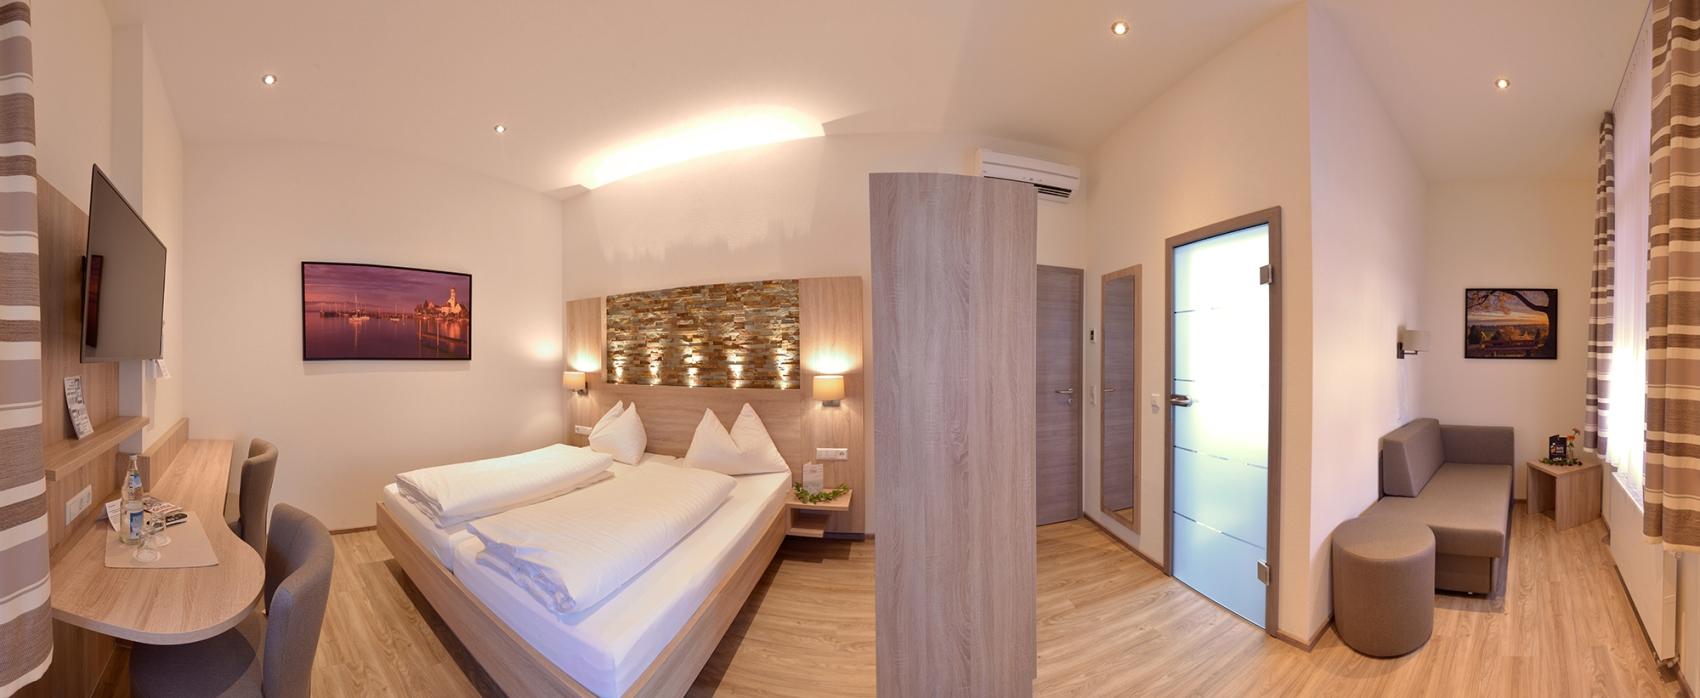 Doppelzimmer Superior 23m²